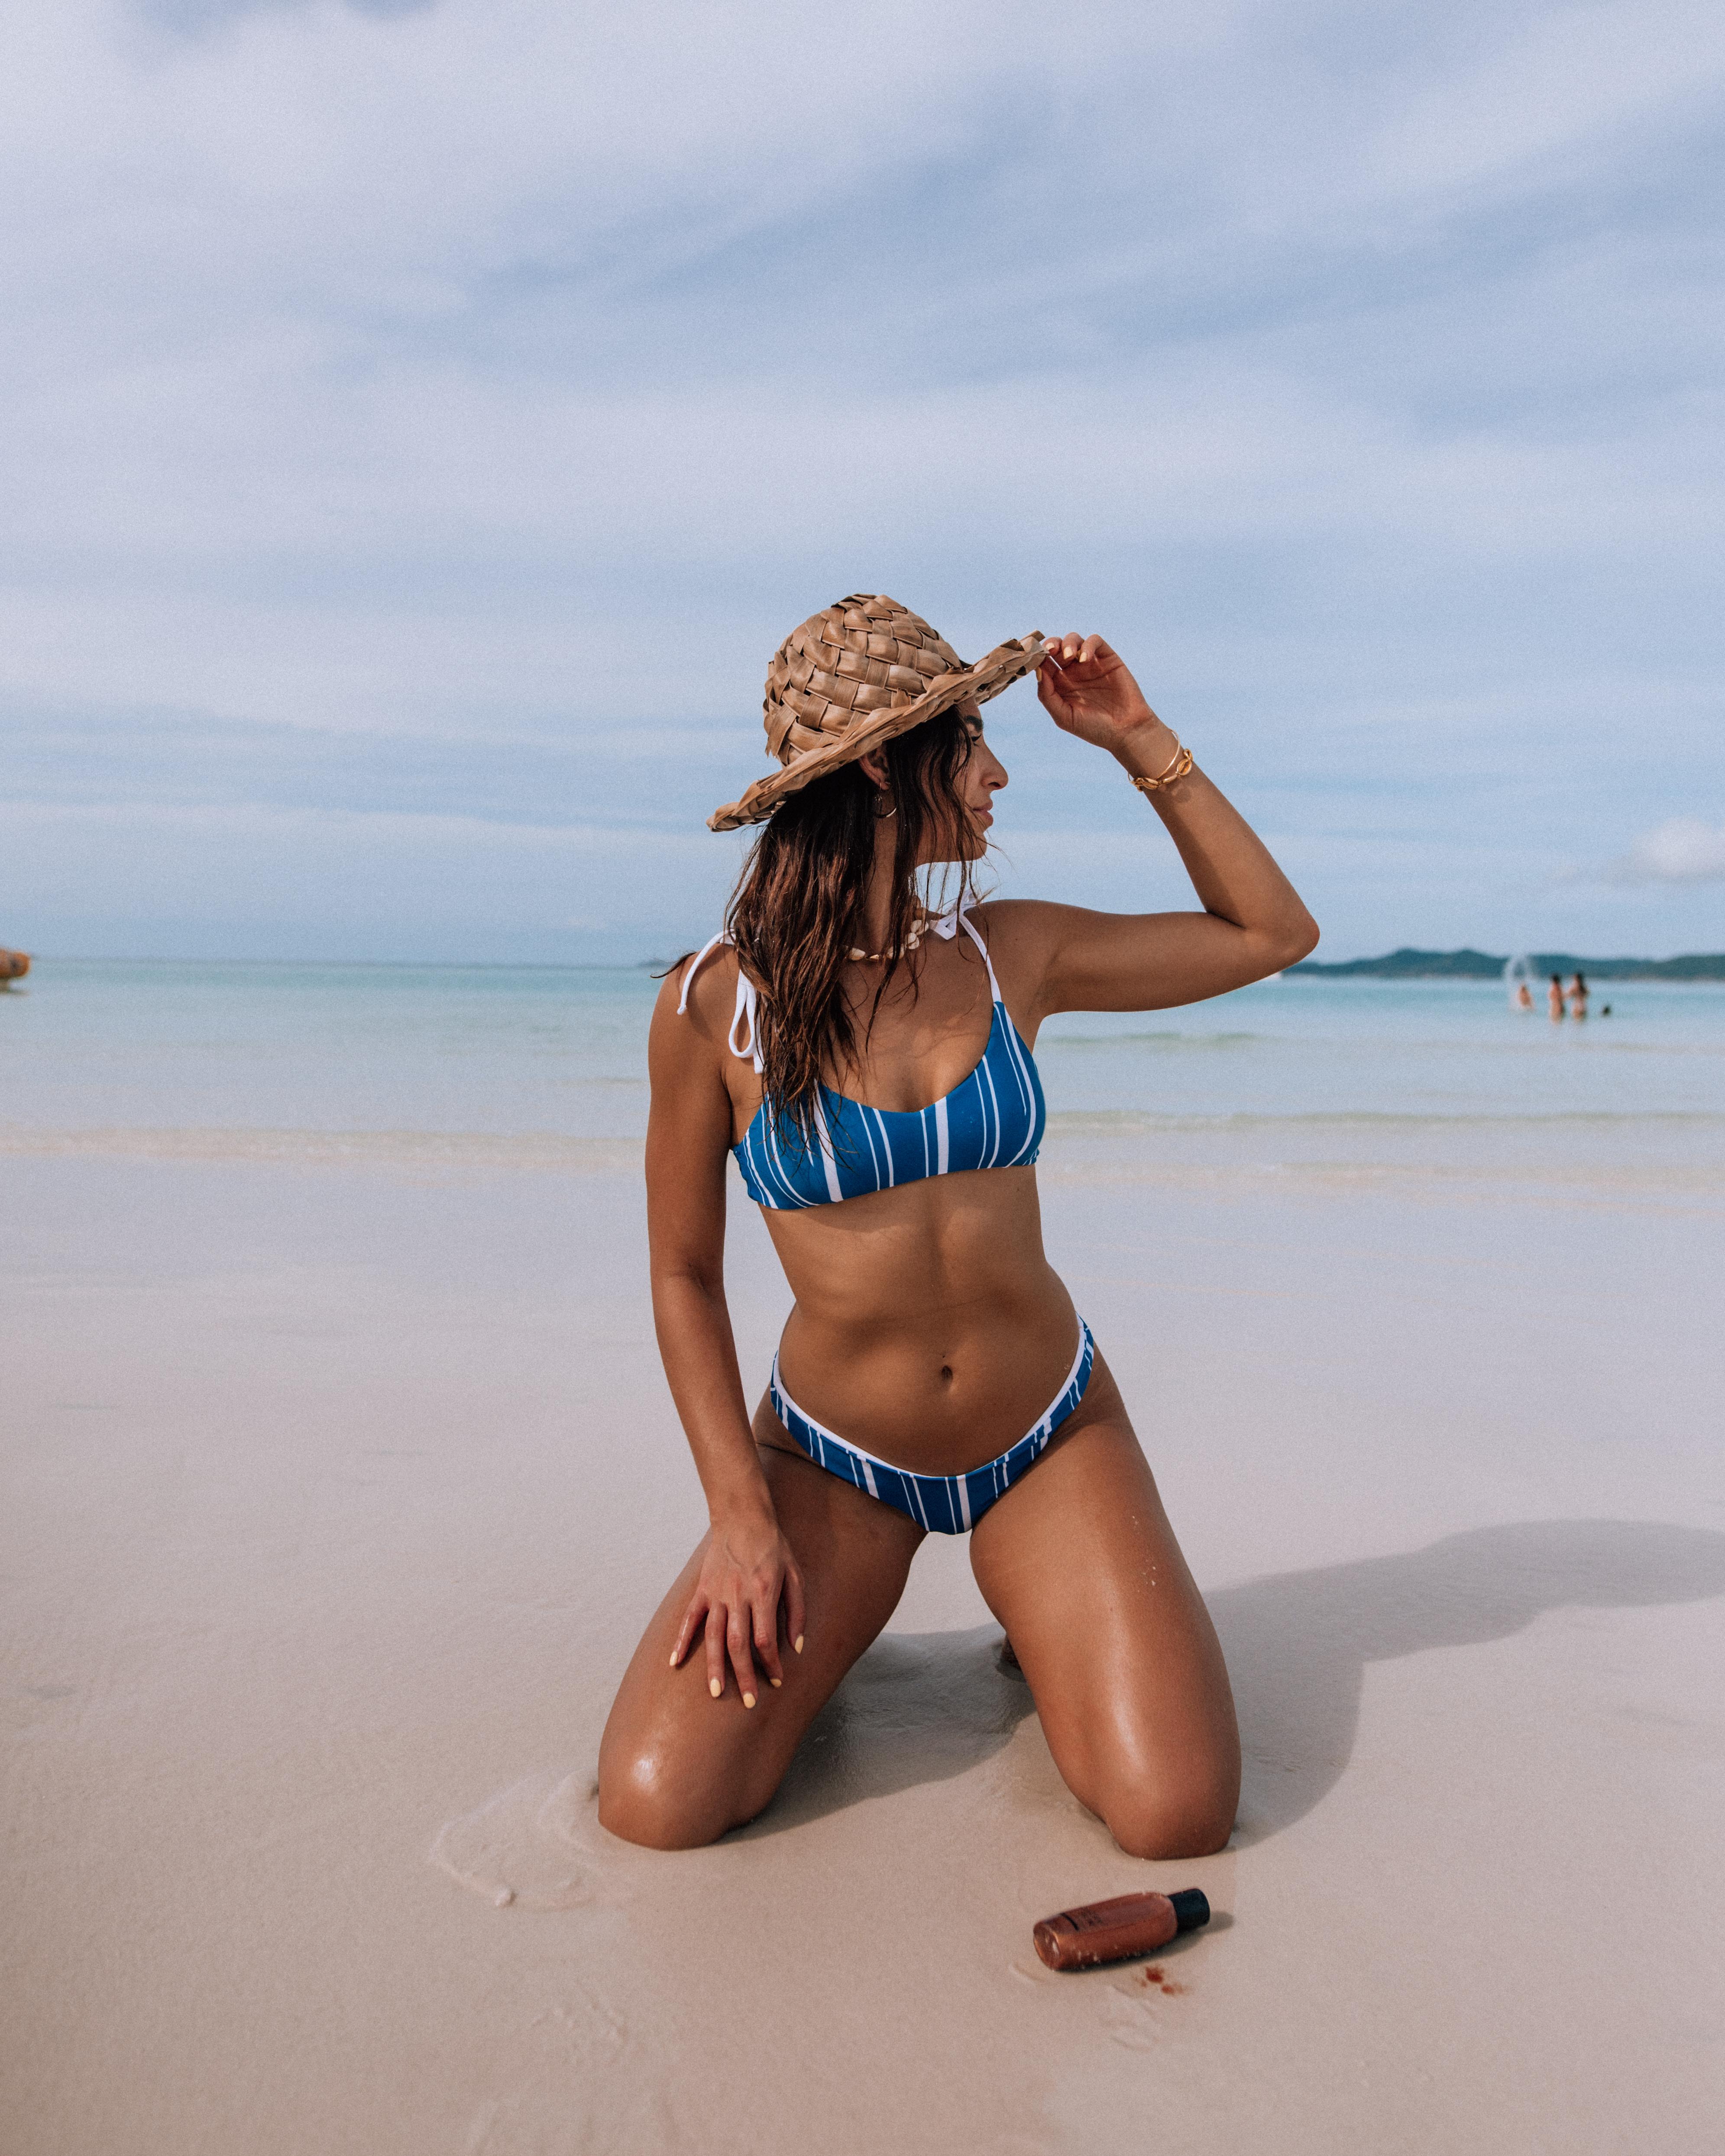 Support Western Australian swimwear brands and stay on trend